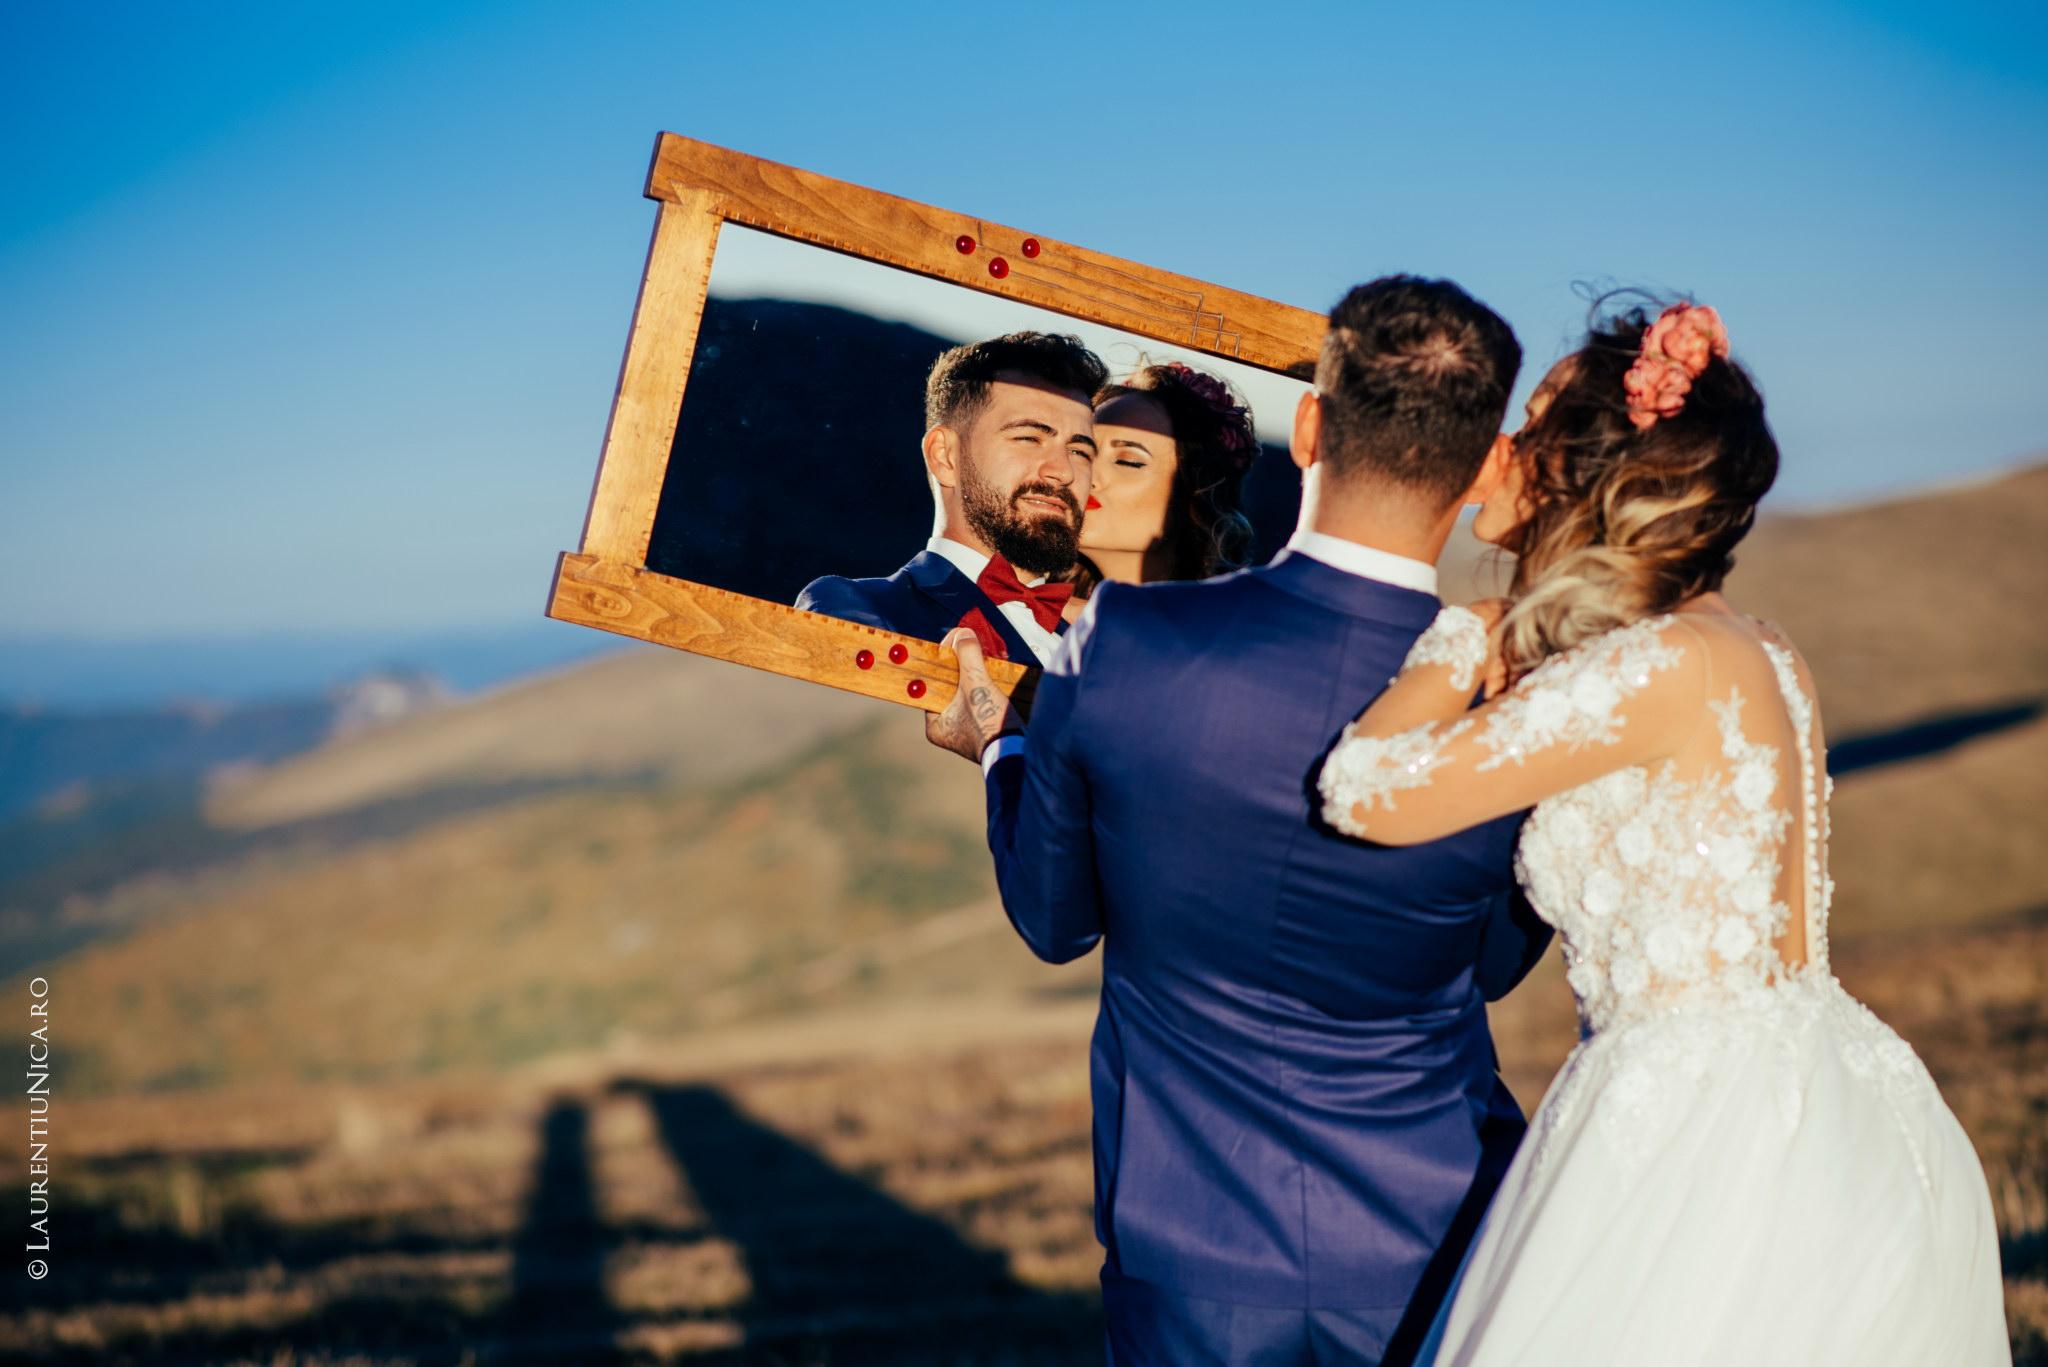 aida si alin fotograf nunta laurentiu nica transalpina 24 - Aida & Alin | Fotografii After Wedding | Transalpina - Muntii Parang